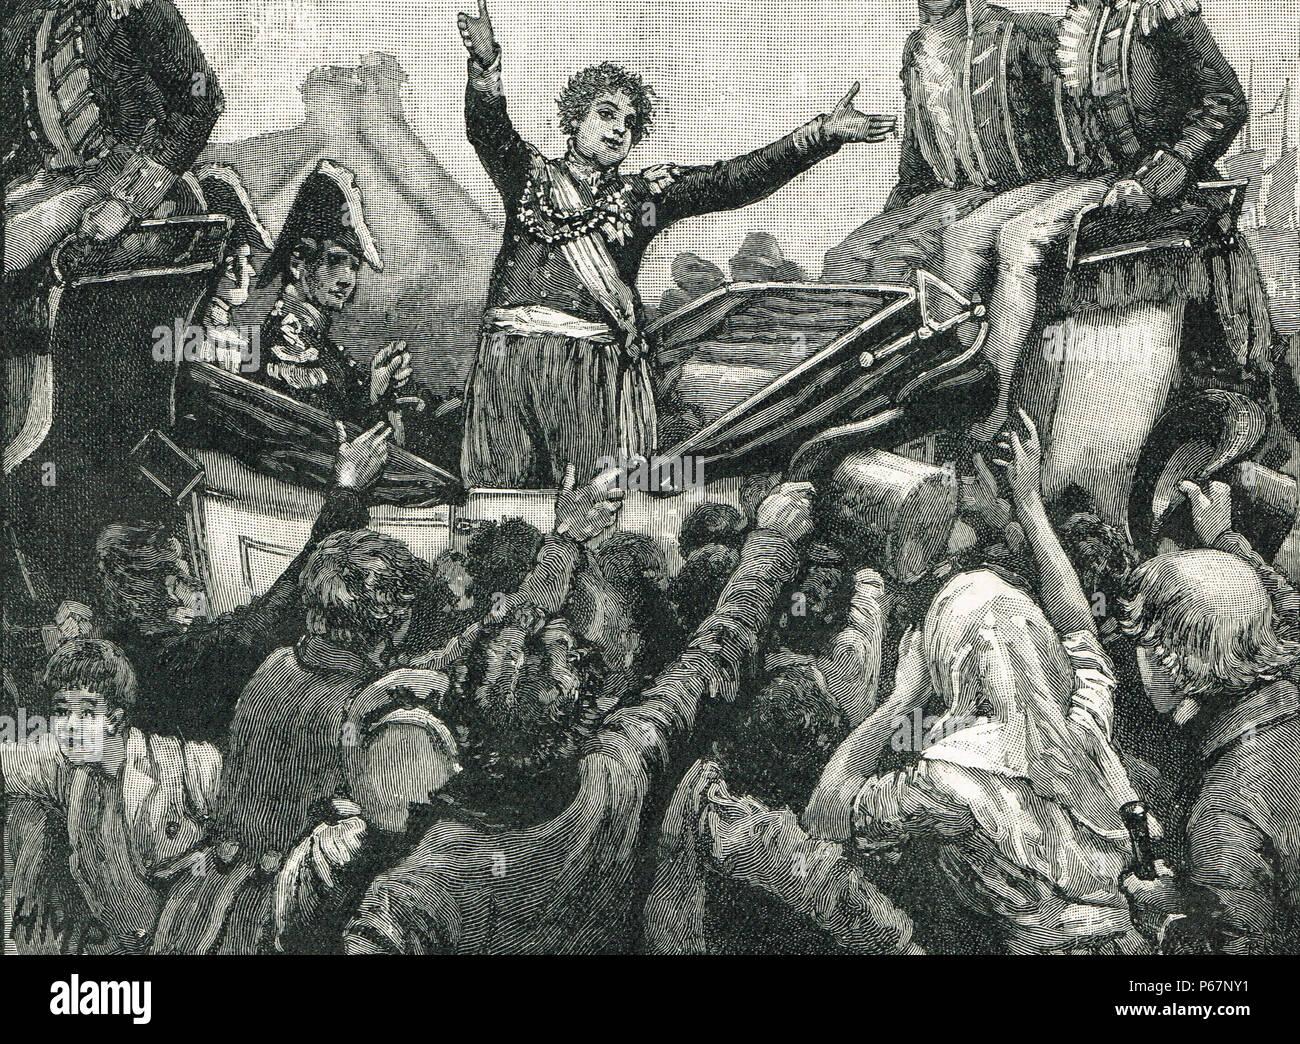 landing of King George IV, Howth harbour, Dublin, Ireland, 1821 - Stock Image